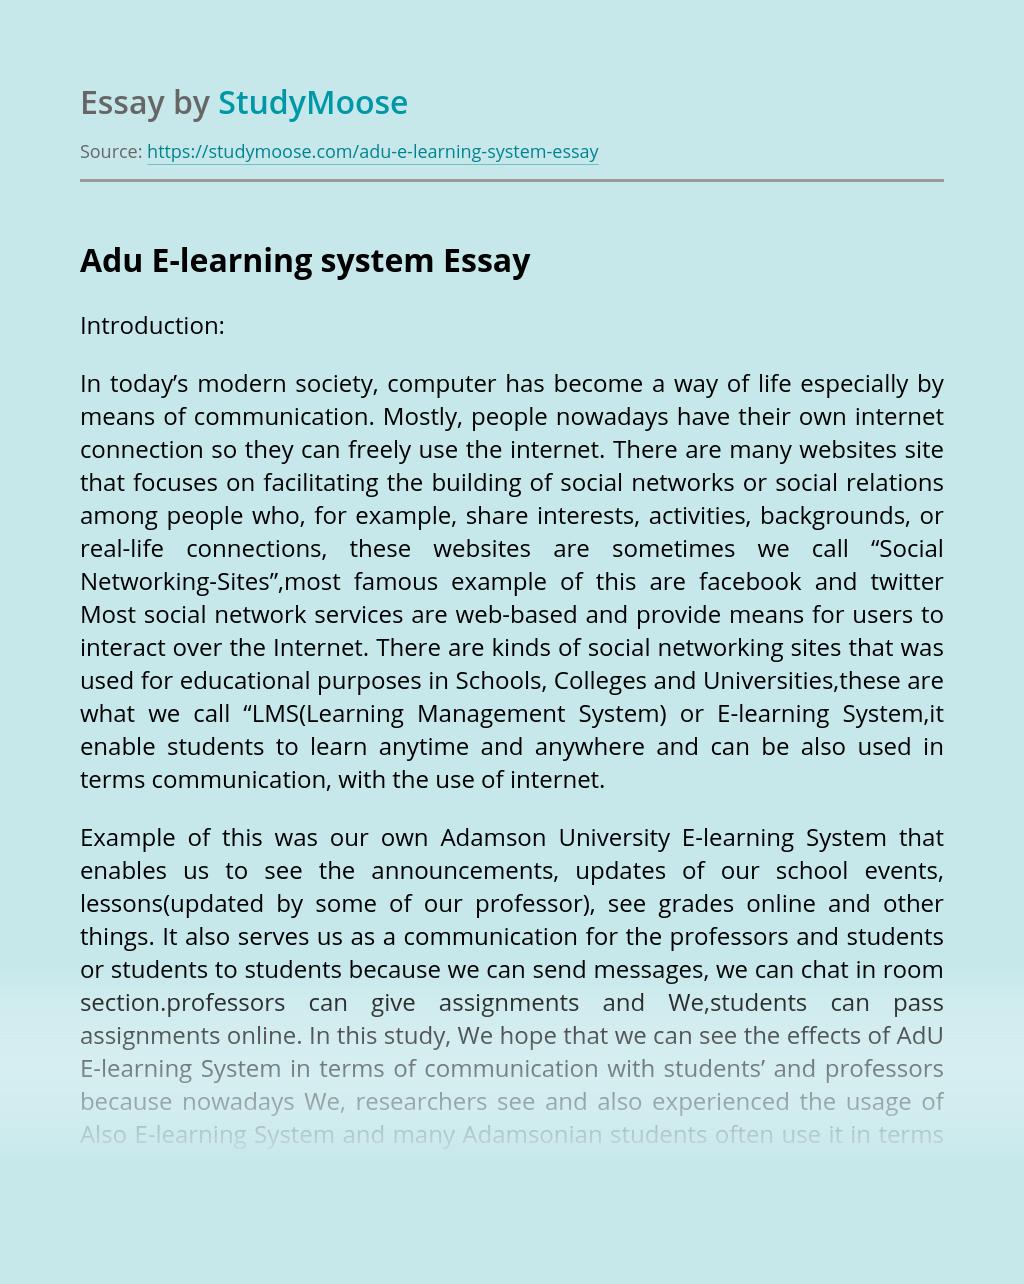 Adu E-learning system